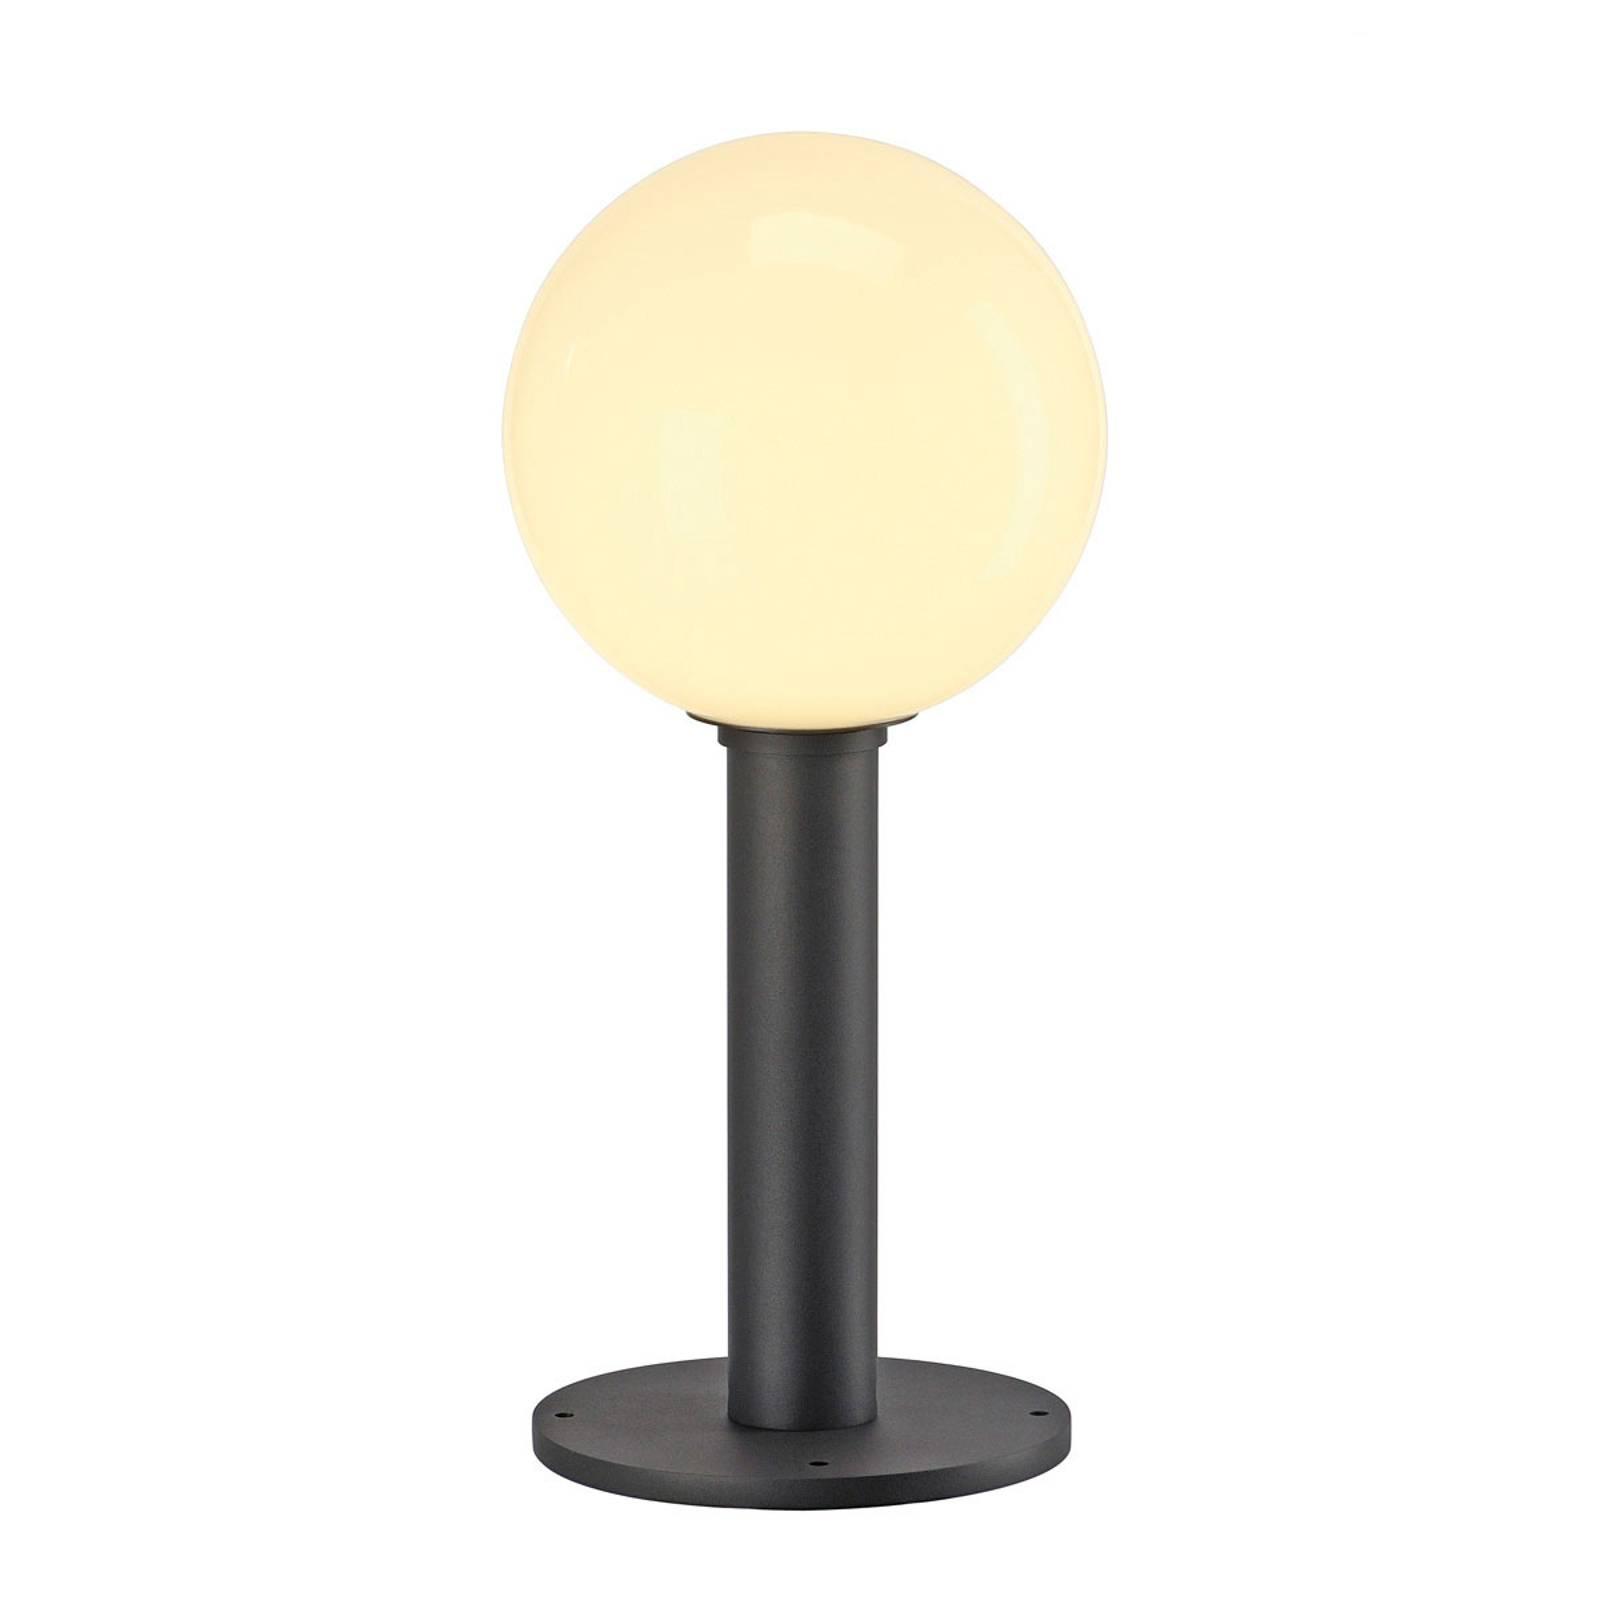 SLV Gloo Pure 44 -pollarilamppu, korkeus 44 cm